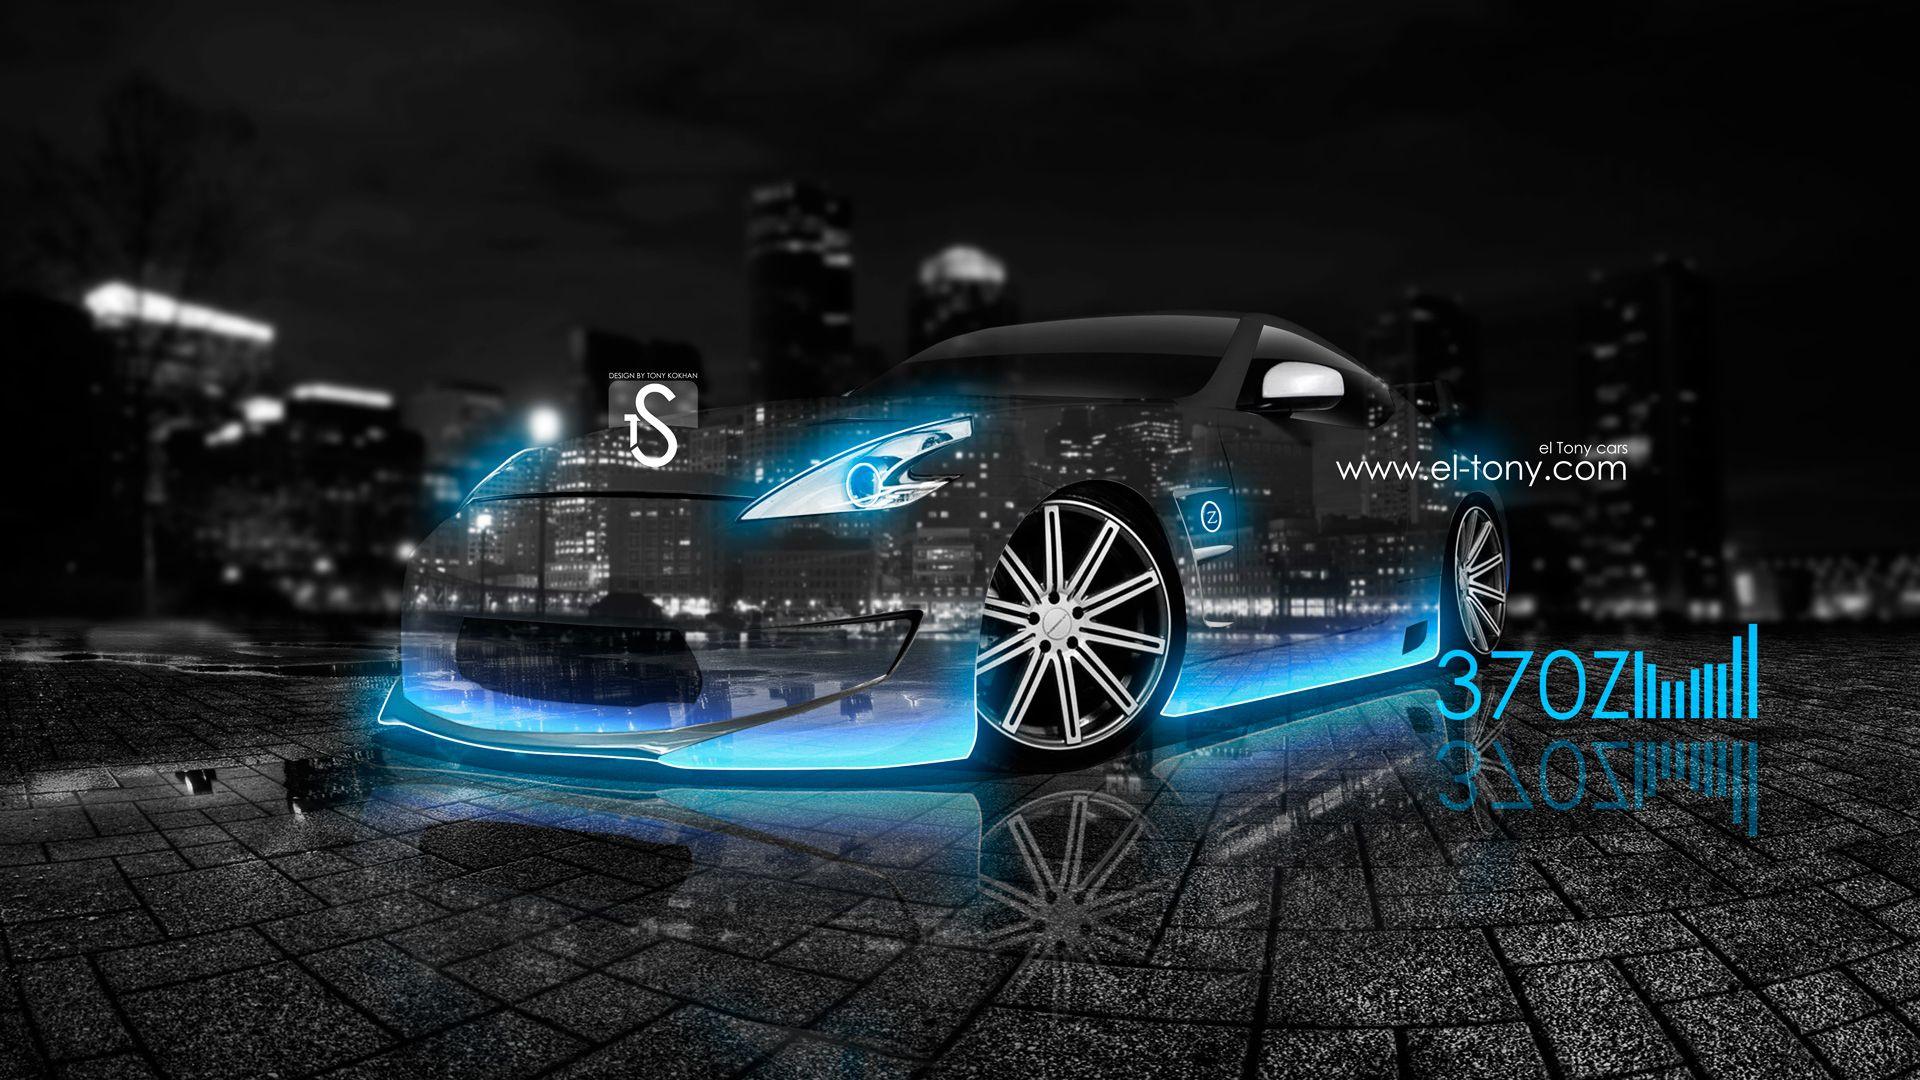 Ordinaire Nissan 370Z Crystal City Car 2013 « El Tony